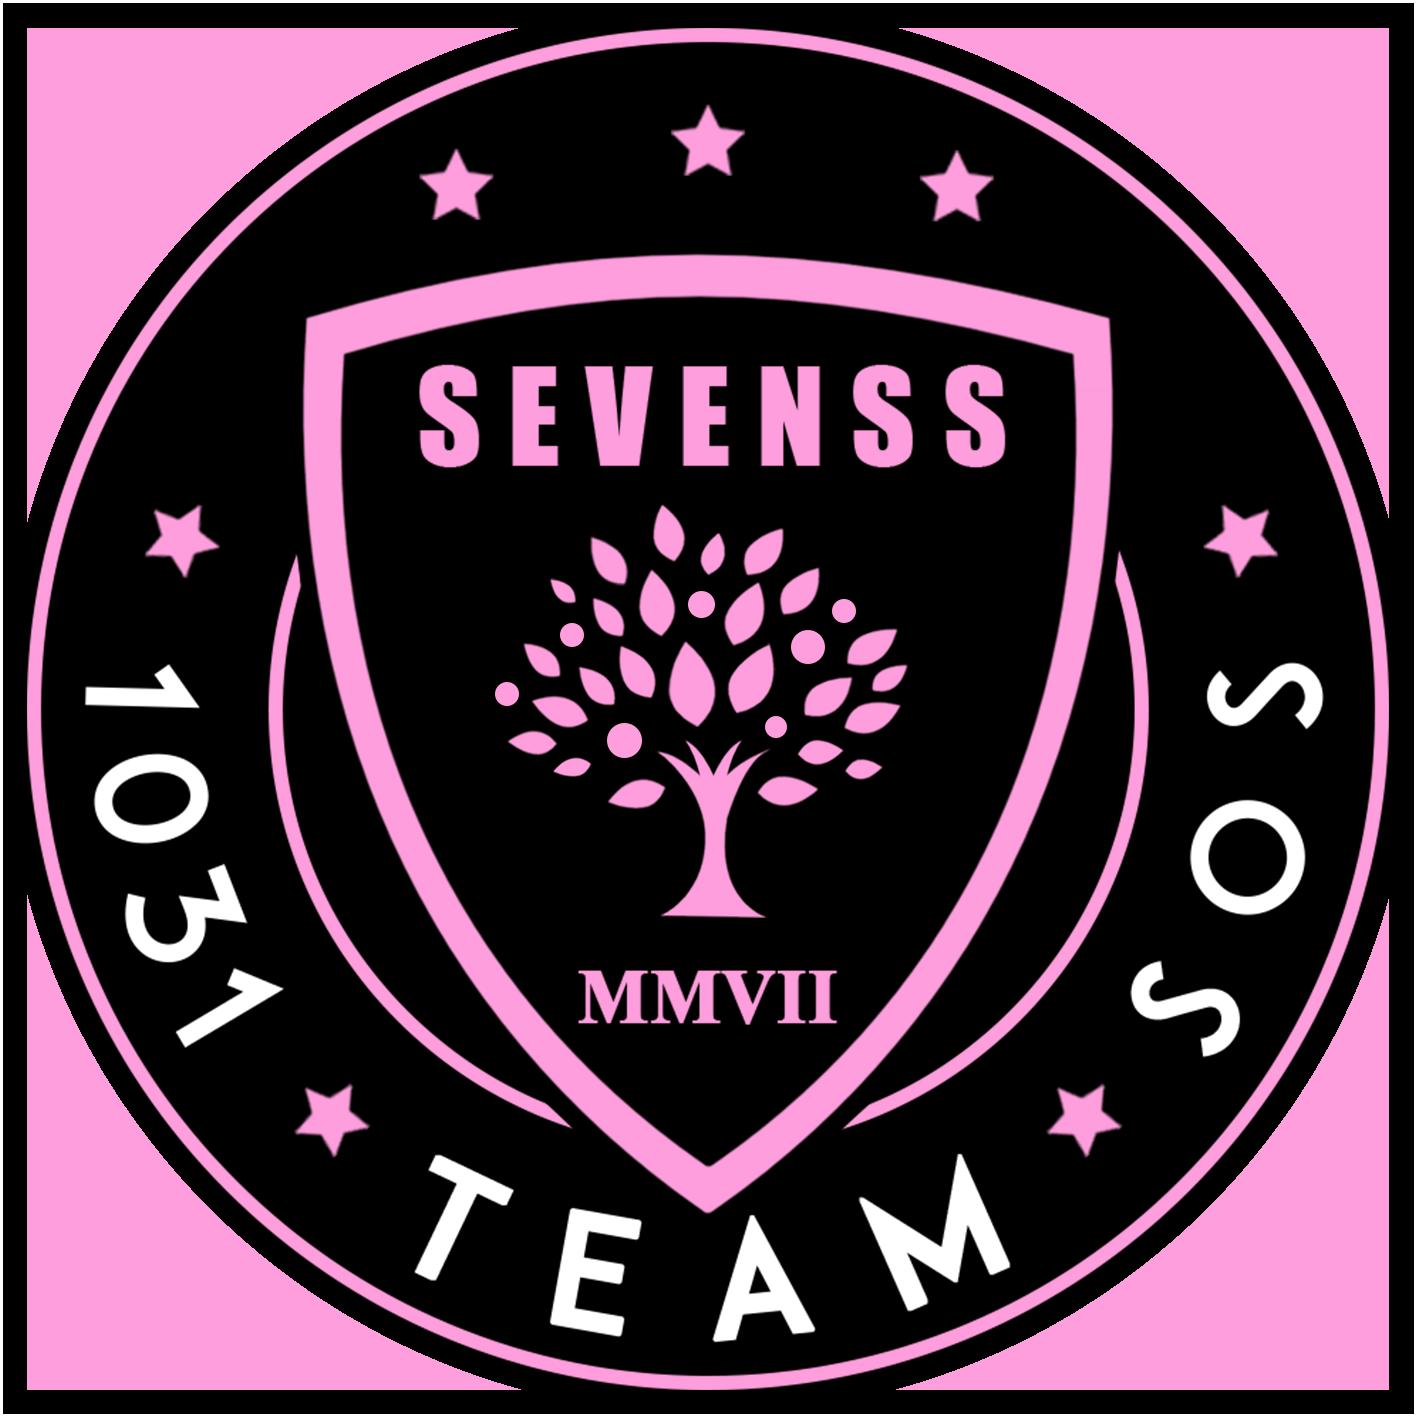 Sevenss